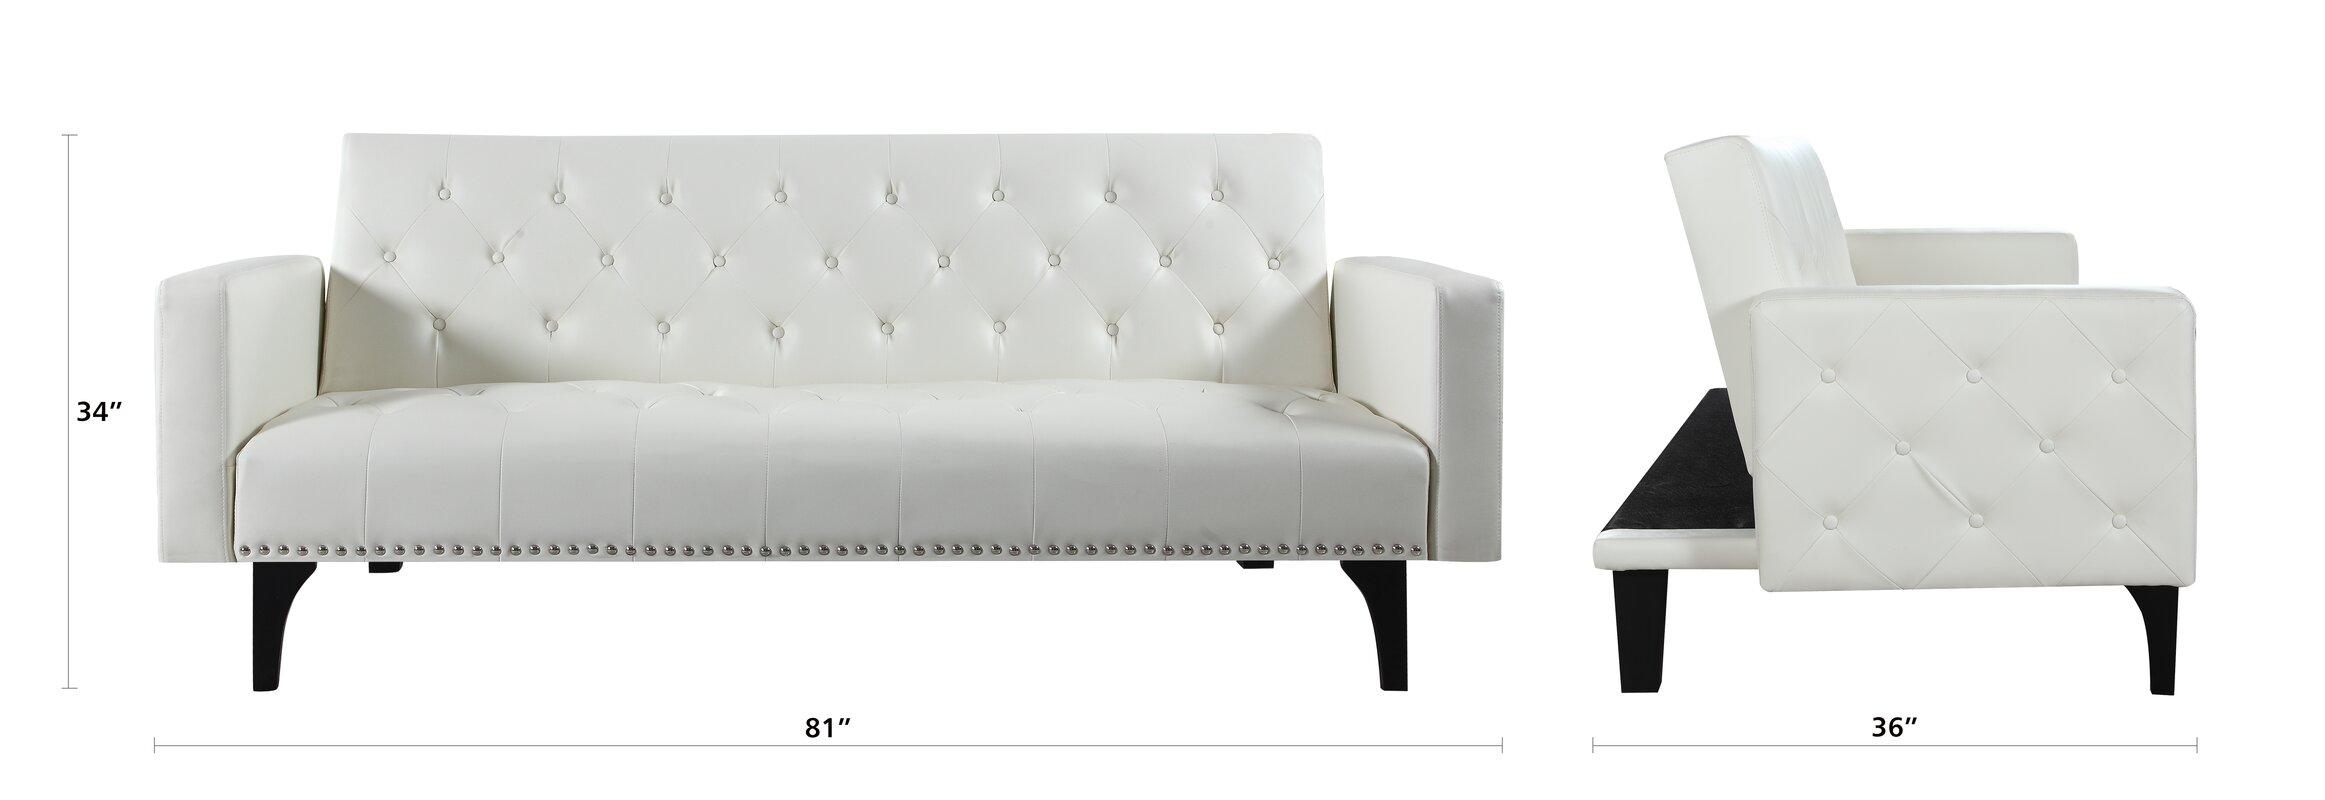 High Quality Rathbun Modern Tufted Reclining Sleeper Sofa